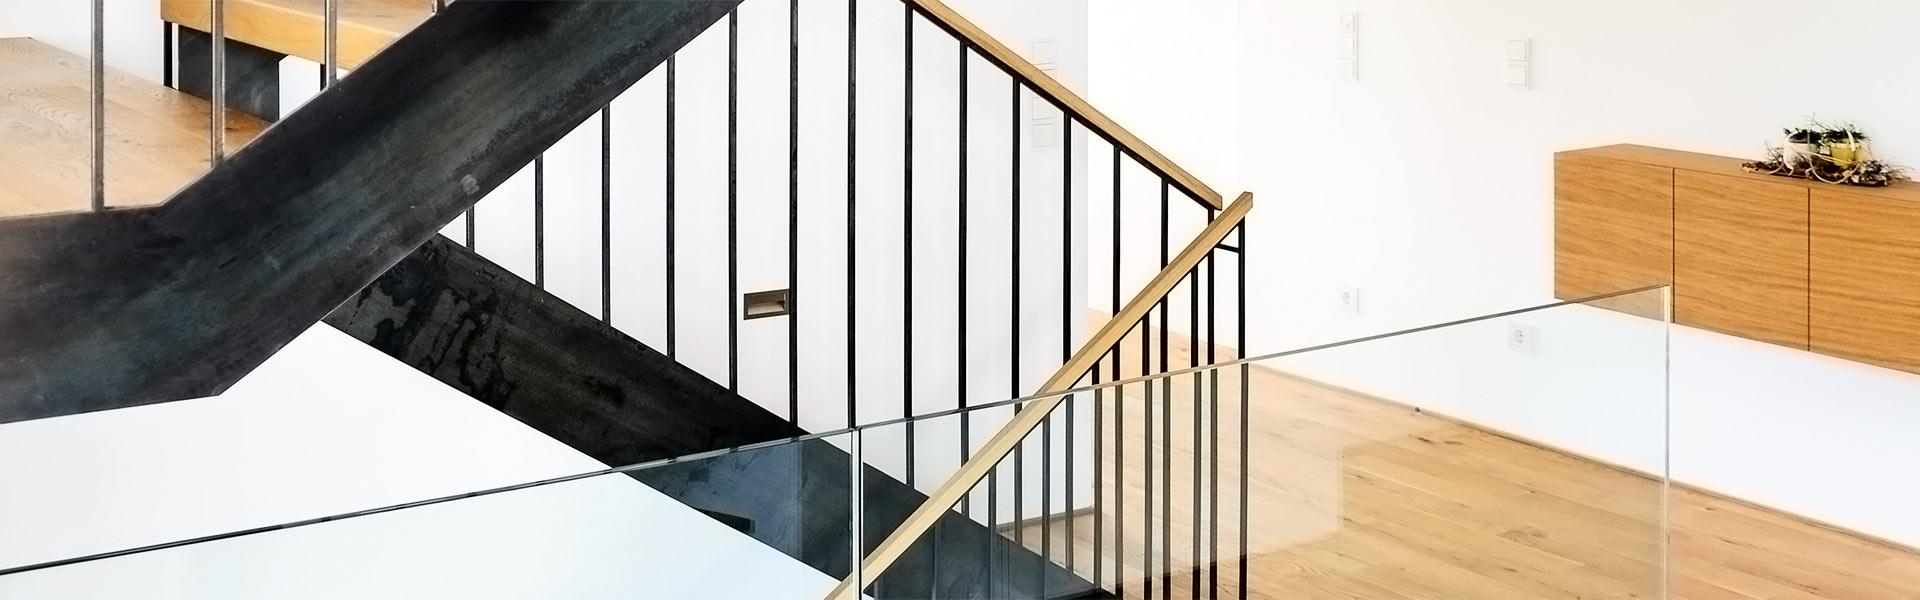 Holzhaus Sanierung